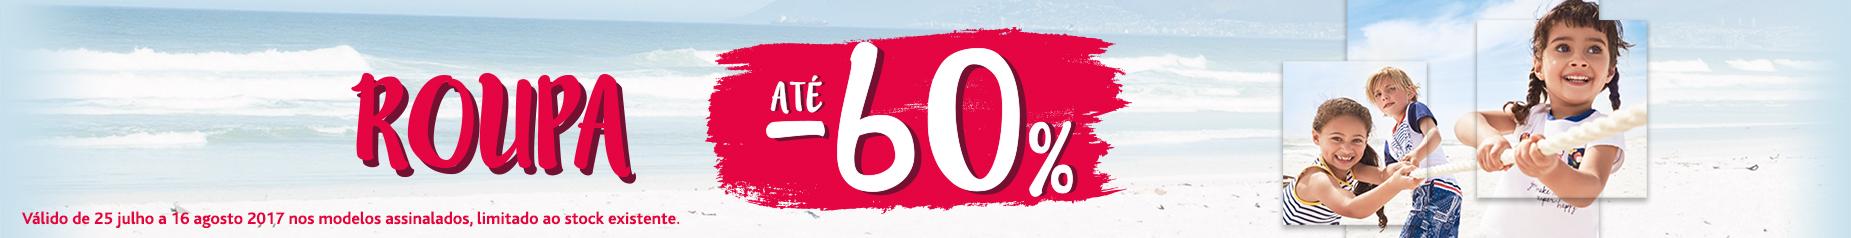 Promoções Roupa até -60%